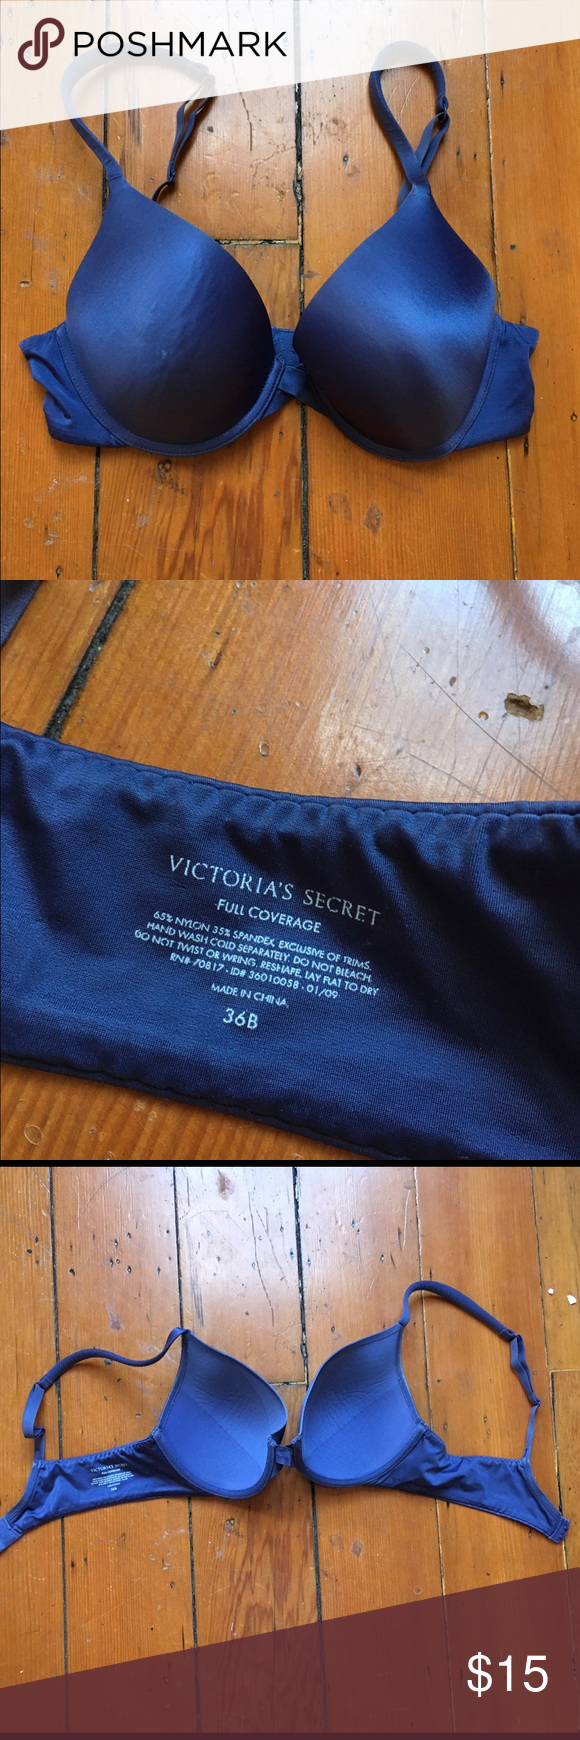 💕Victoria's Secret Bra💕 💕Victoria's Secret Full coverage bra💕 36B❕ Victoria's Secret Intimates & Sleepwear Bras